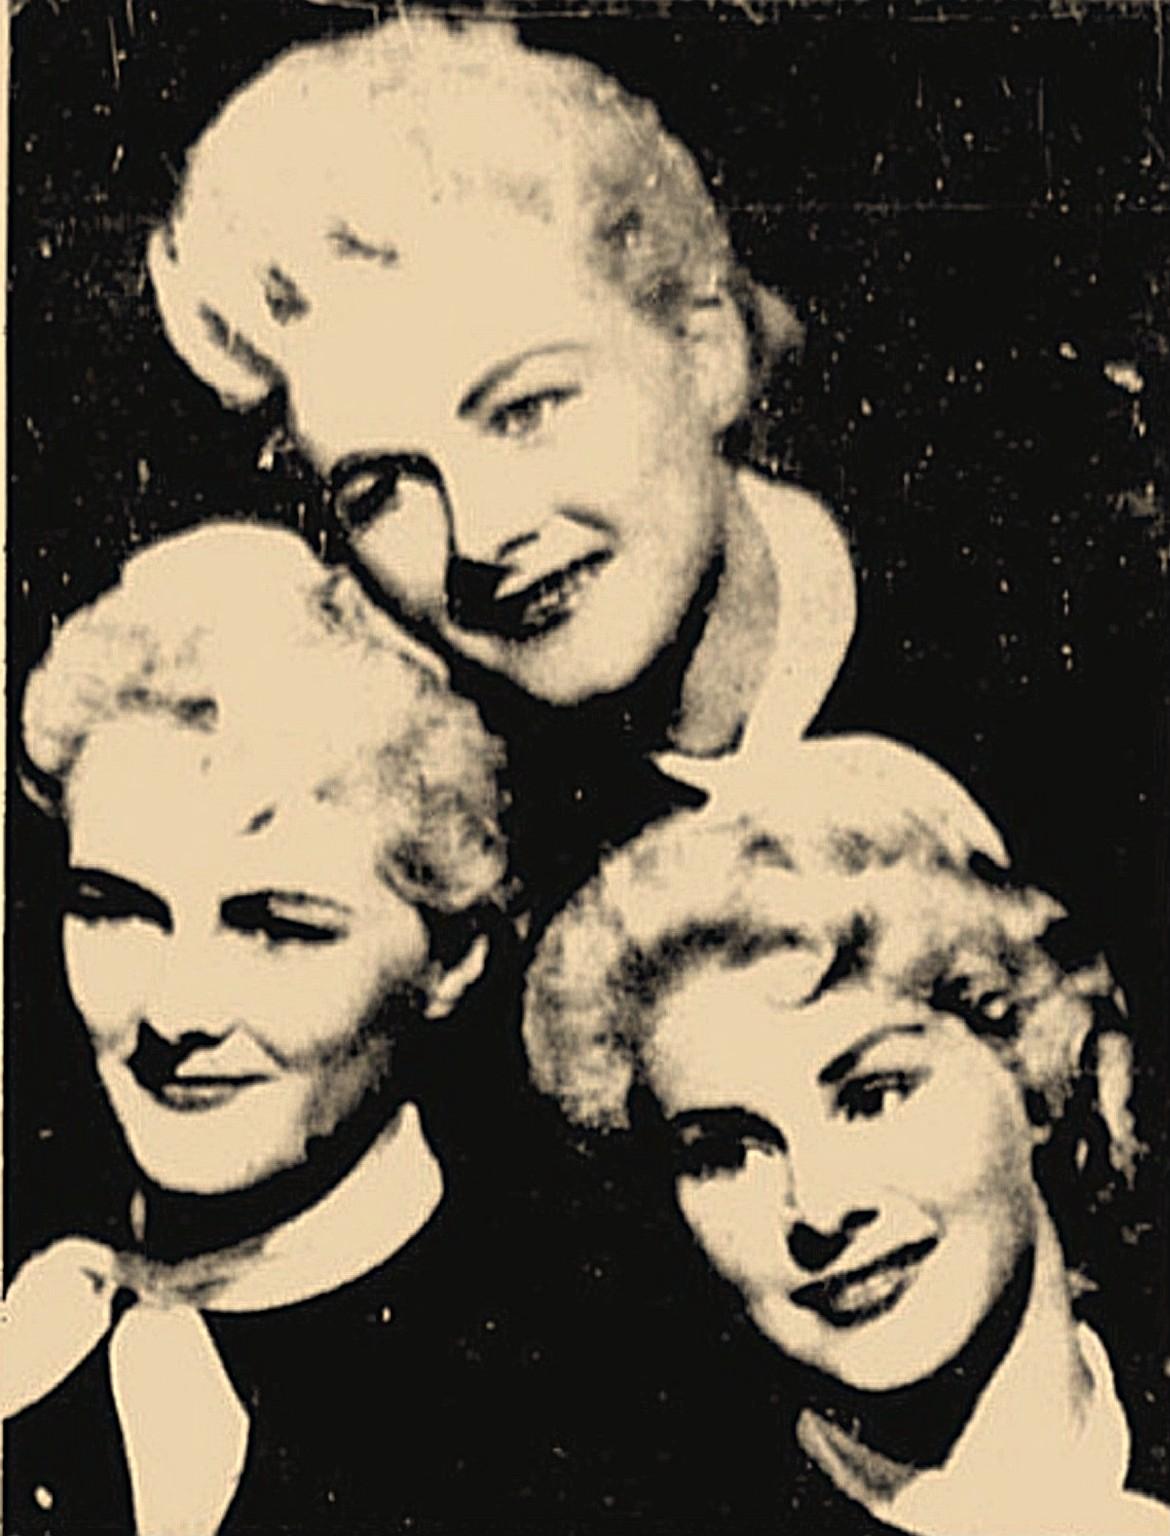 picture-of-girls-singing-doo-wap-lesbian-vintage-videos